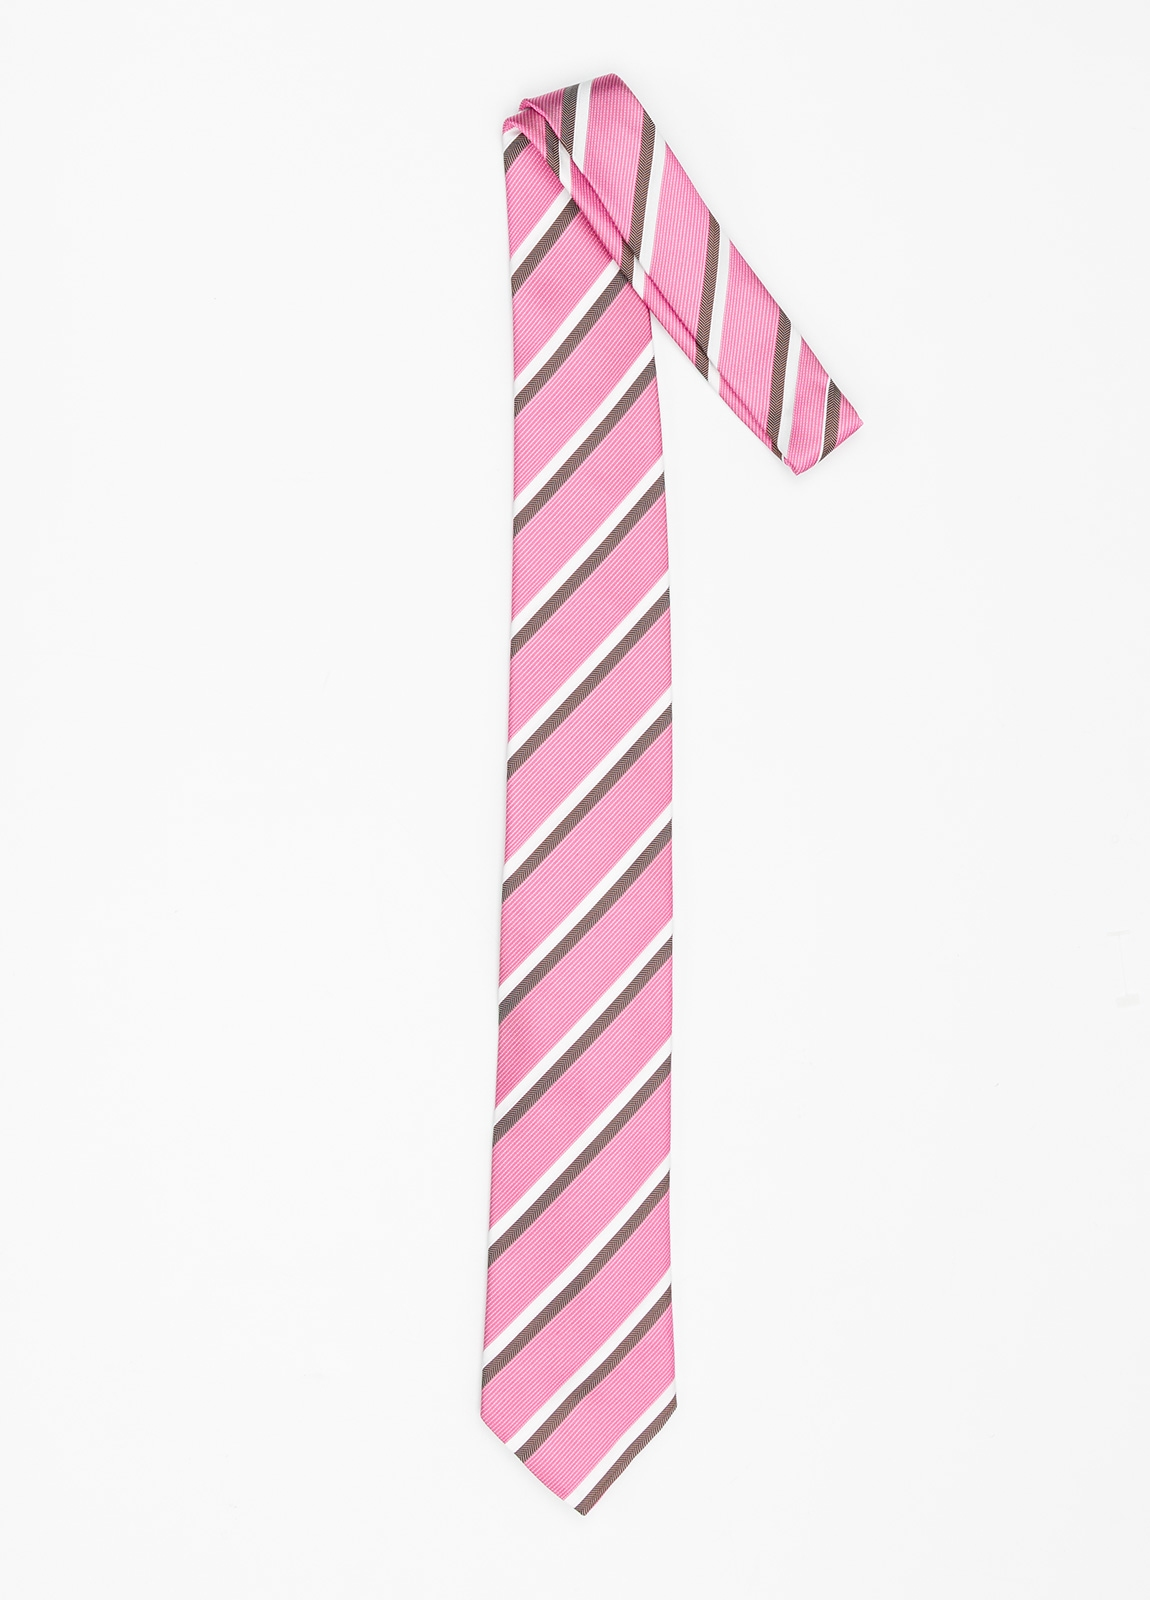 Corbata Formal Wear rayas en diagonal color rosa. Pala 7,5 cm. 98% Seda 2% Algodón. - Ítem1